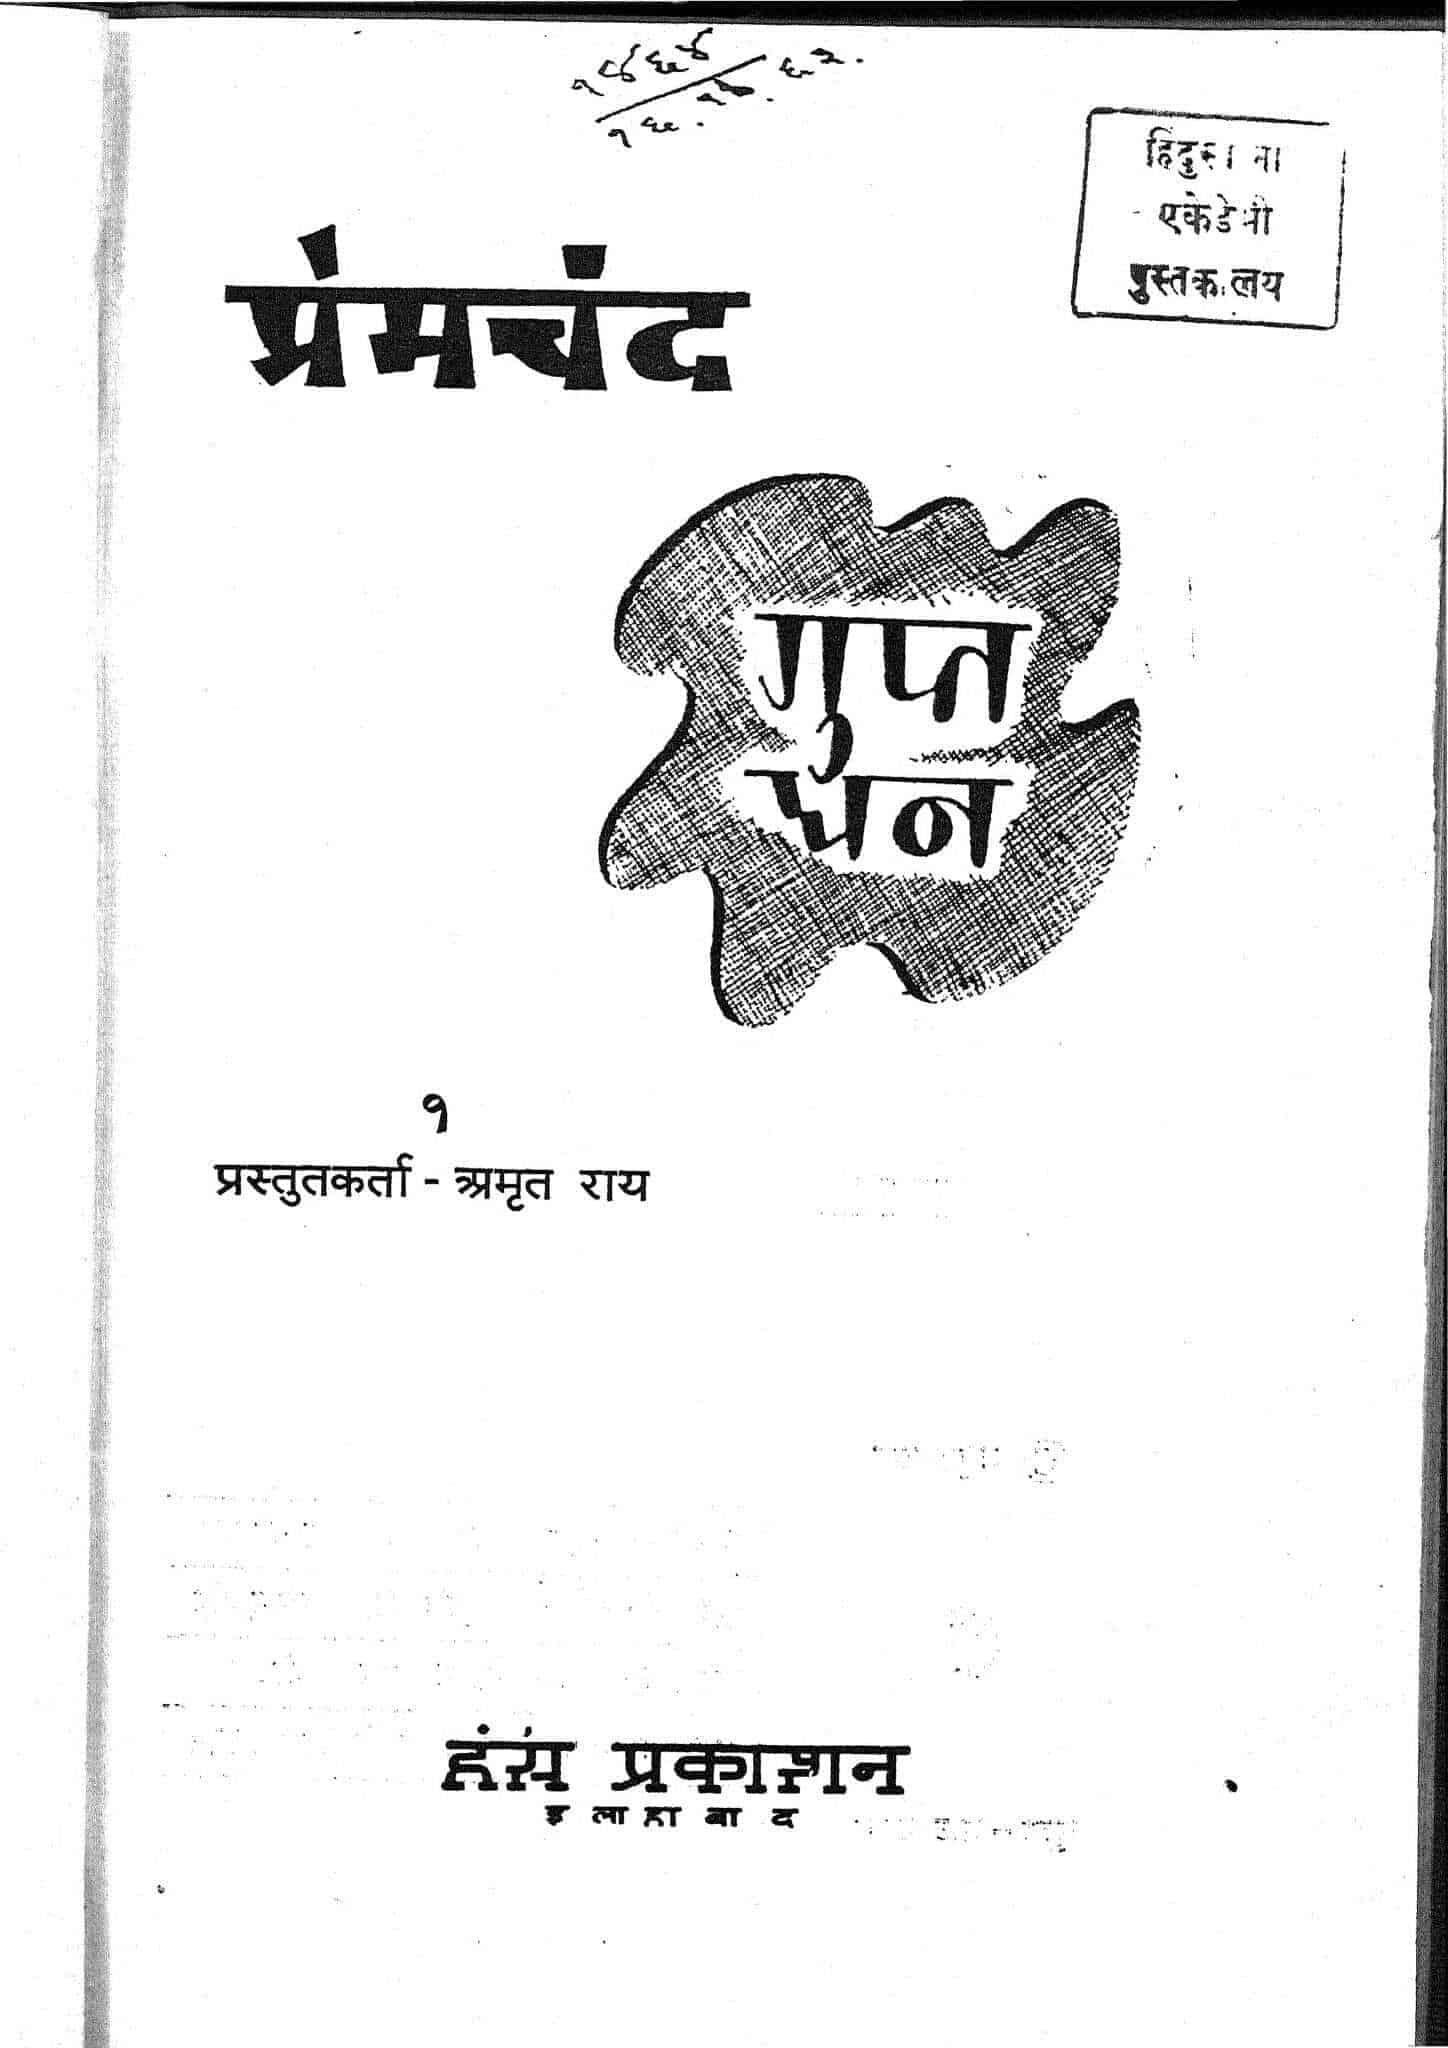 Book Image : प्रेमचंद गुप्त धन  - Premchand Gupt Dhan